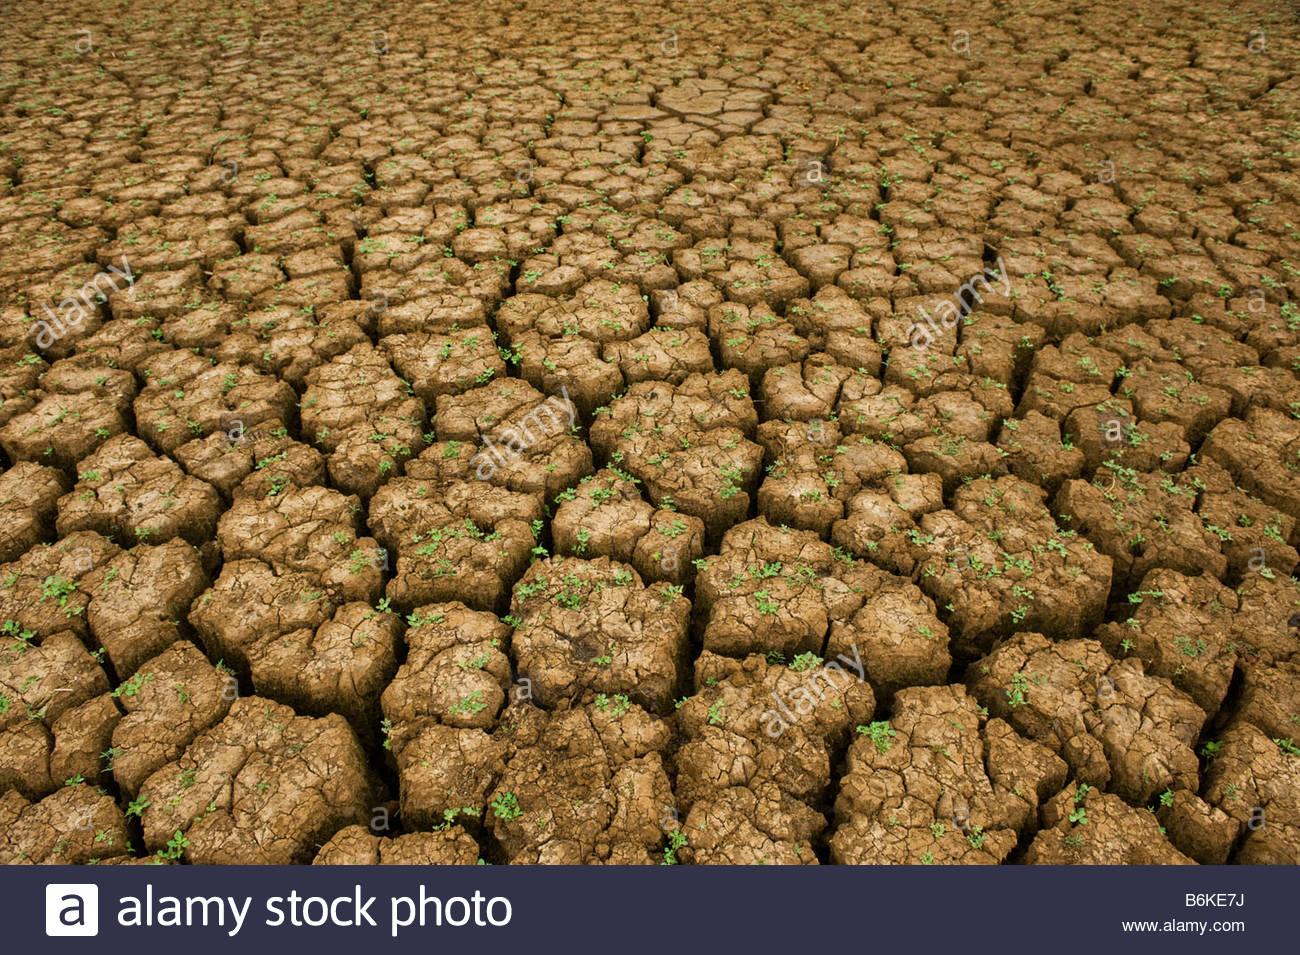 dry season seasoning seasoned weather drain run dry dehydrate dehydrating  dehydrated shrivel shrivelling desiccate - Stock